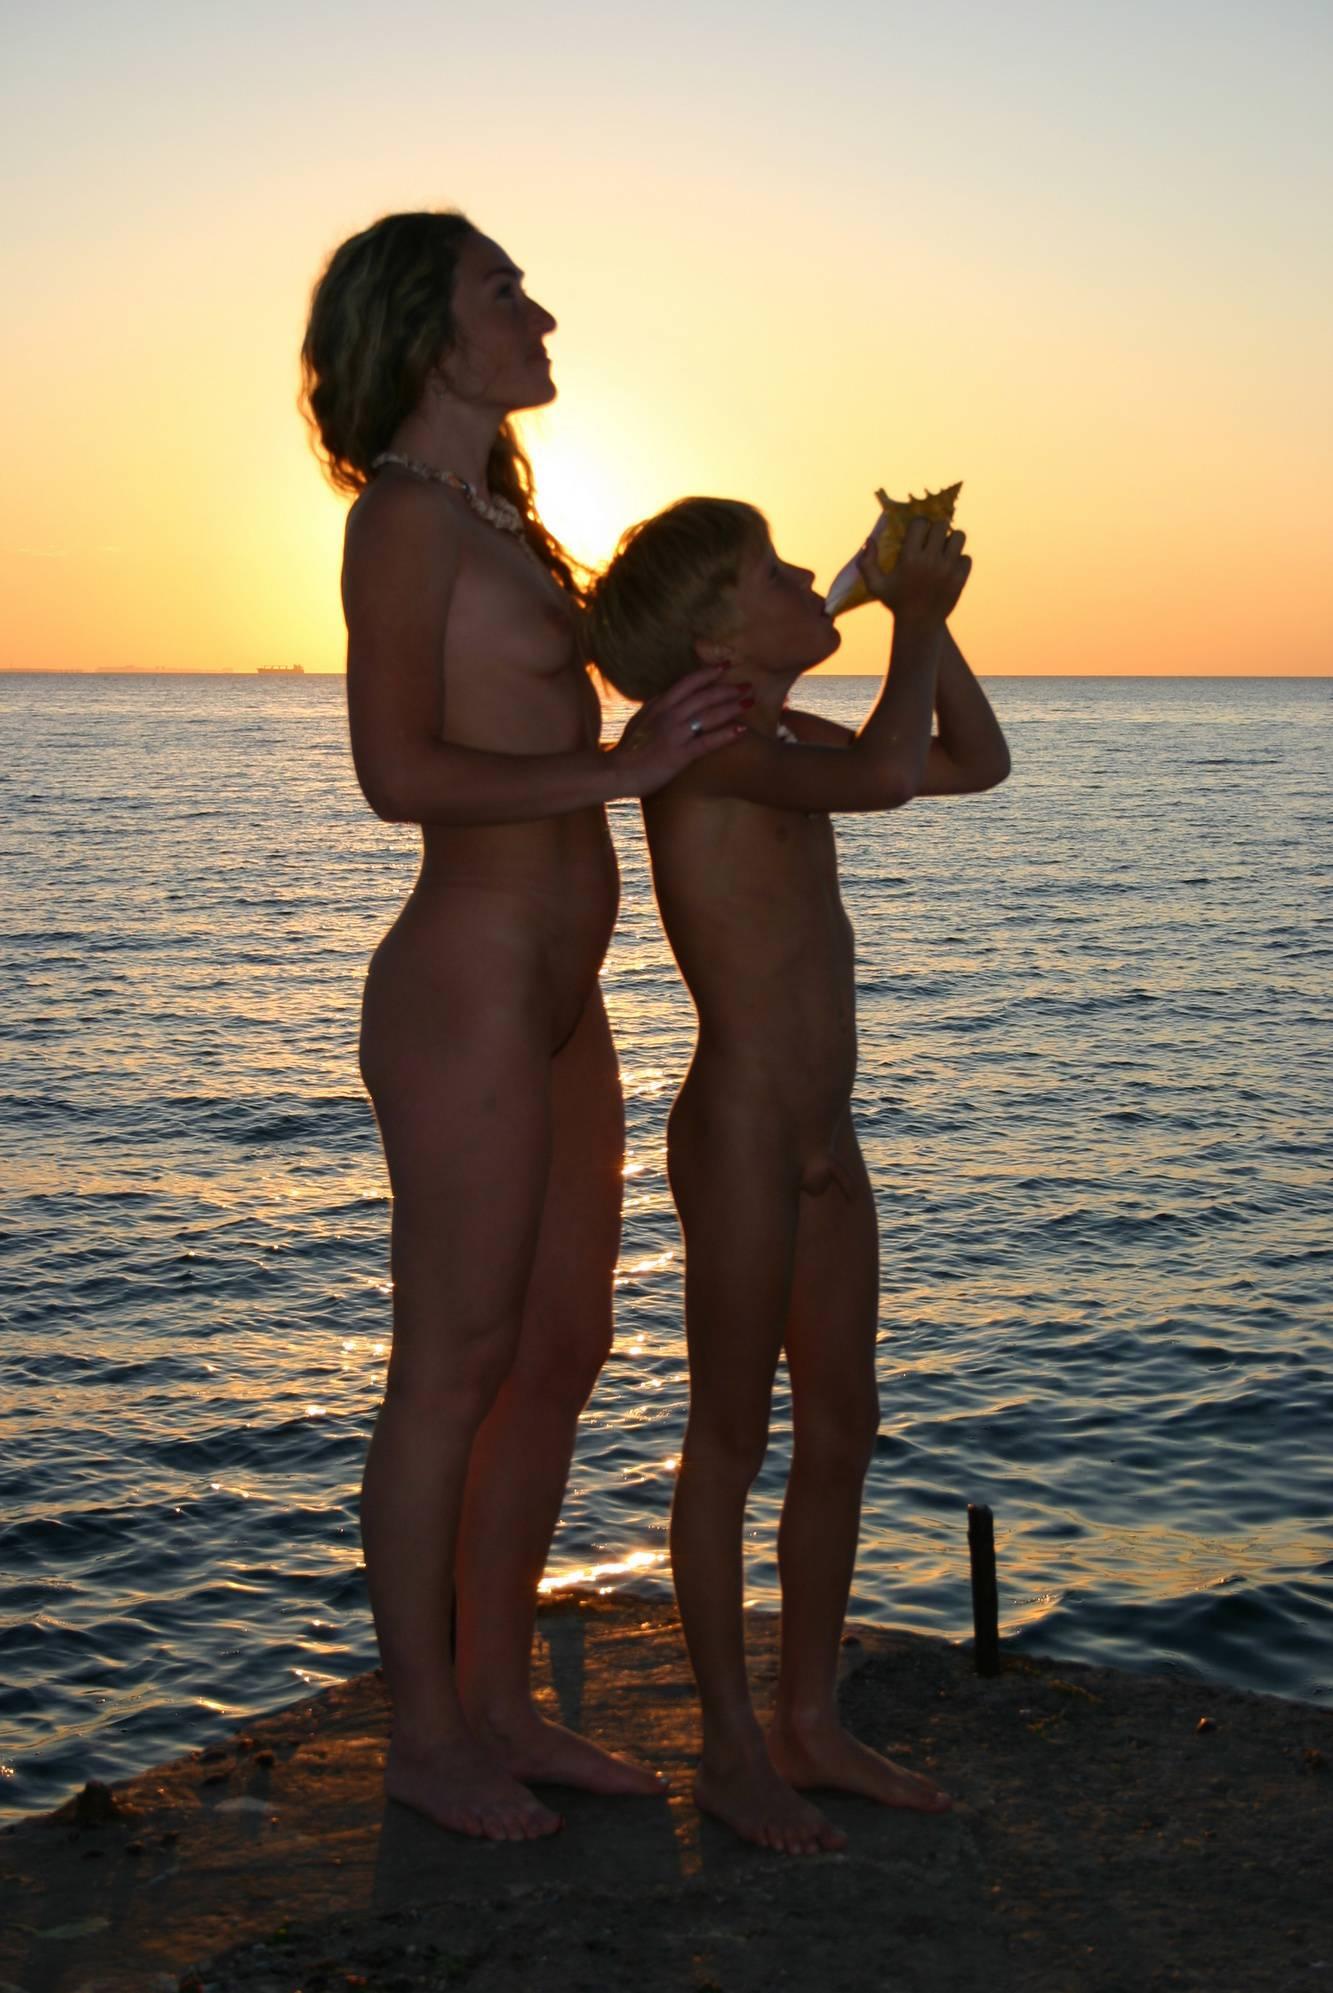 Naturist Family Silhouette - 3